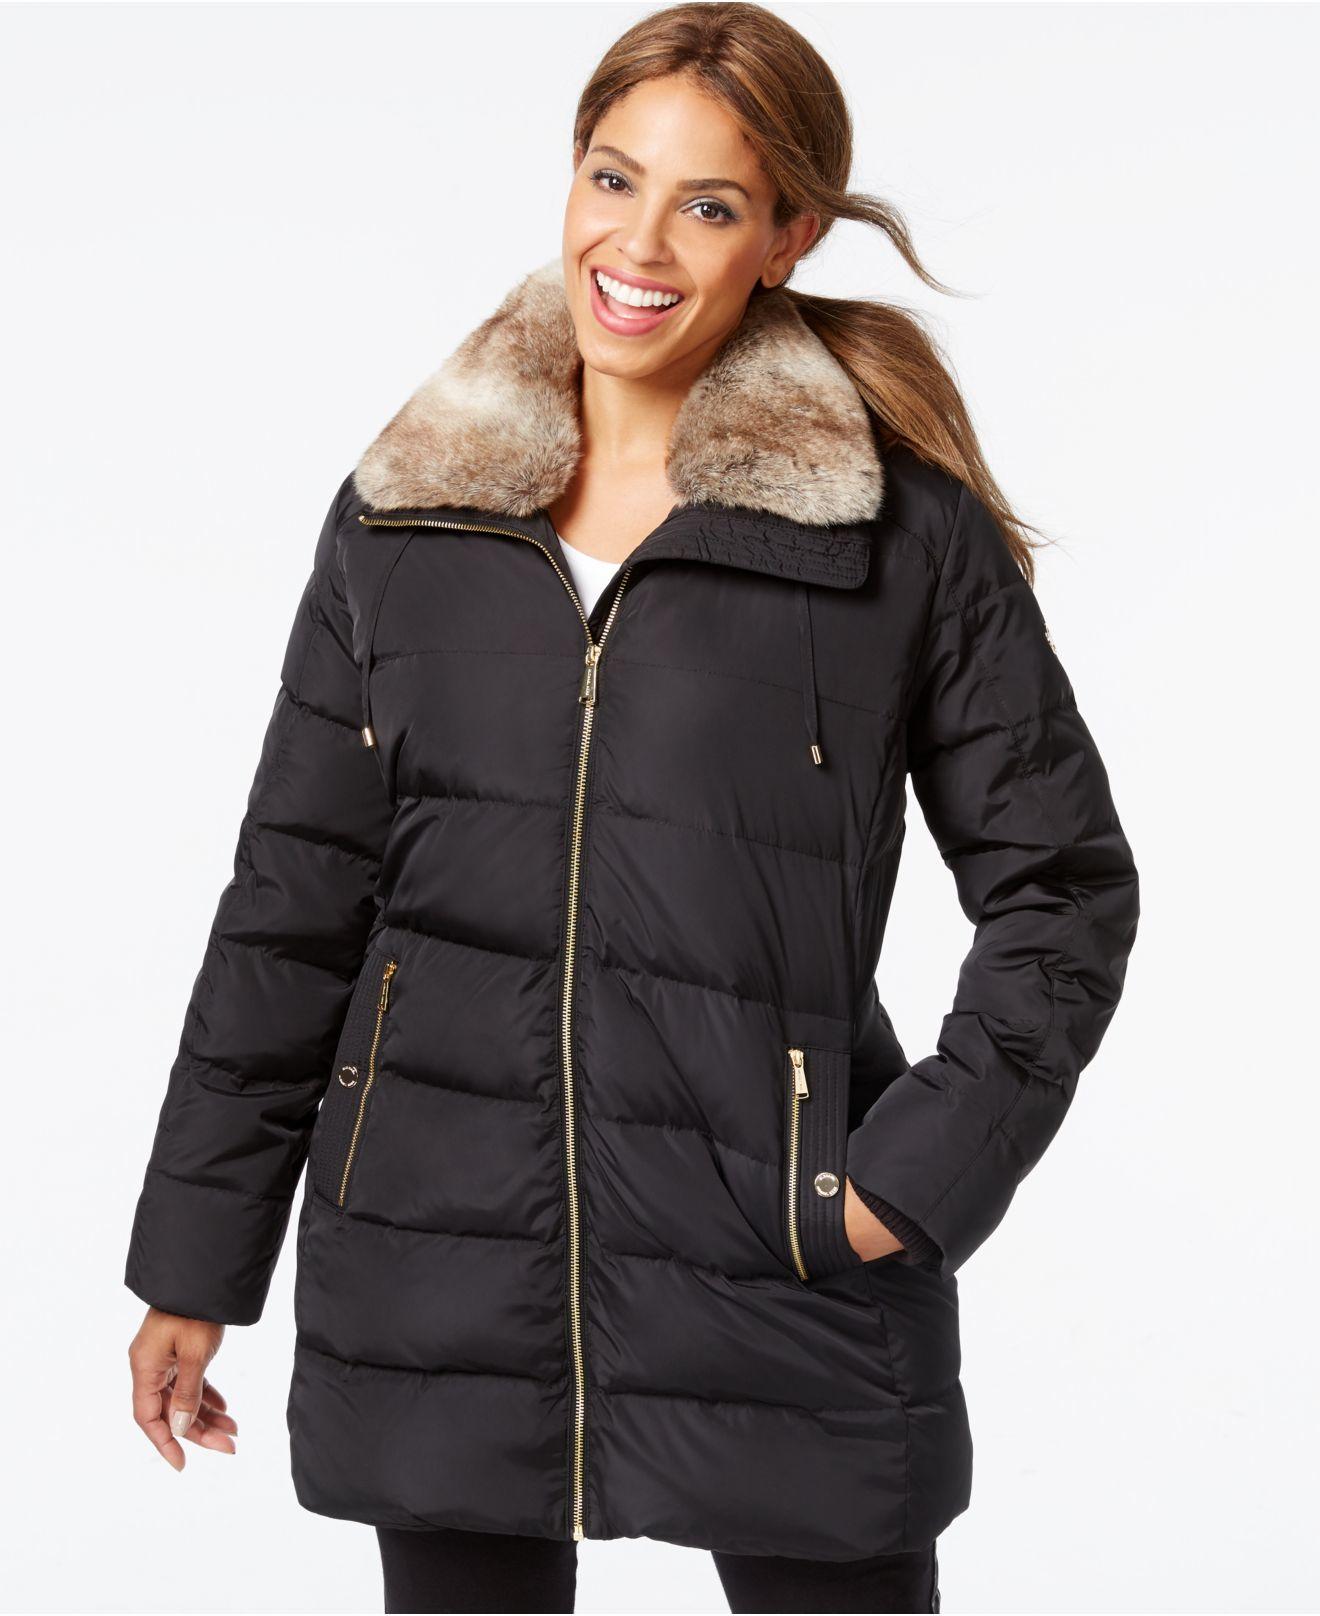 lyst michael kors michael plus size faux fur collar down coat in black. Black Bedroom Furniture Sets. Home Design Ideas